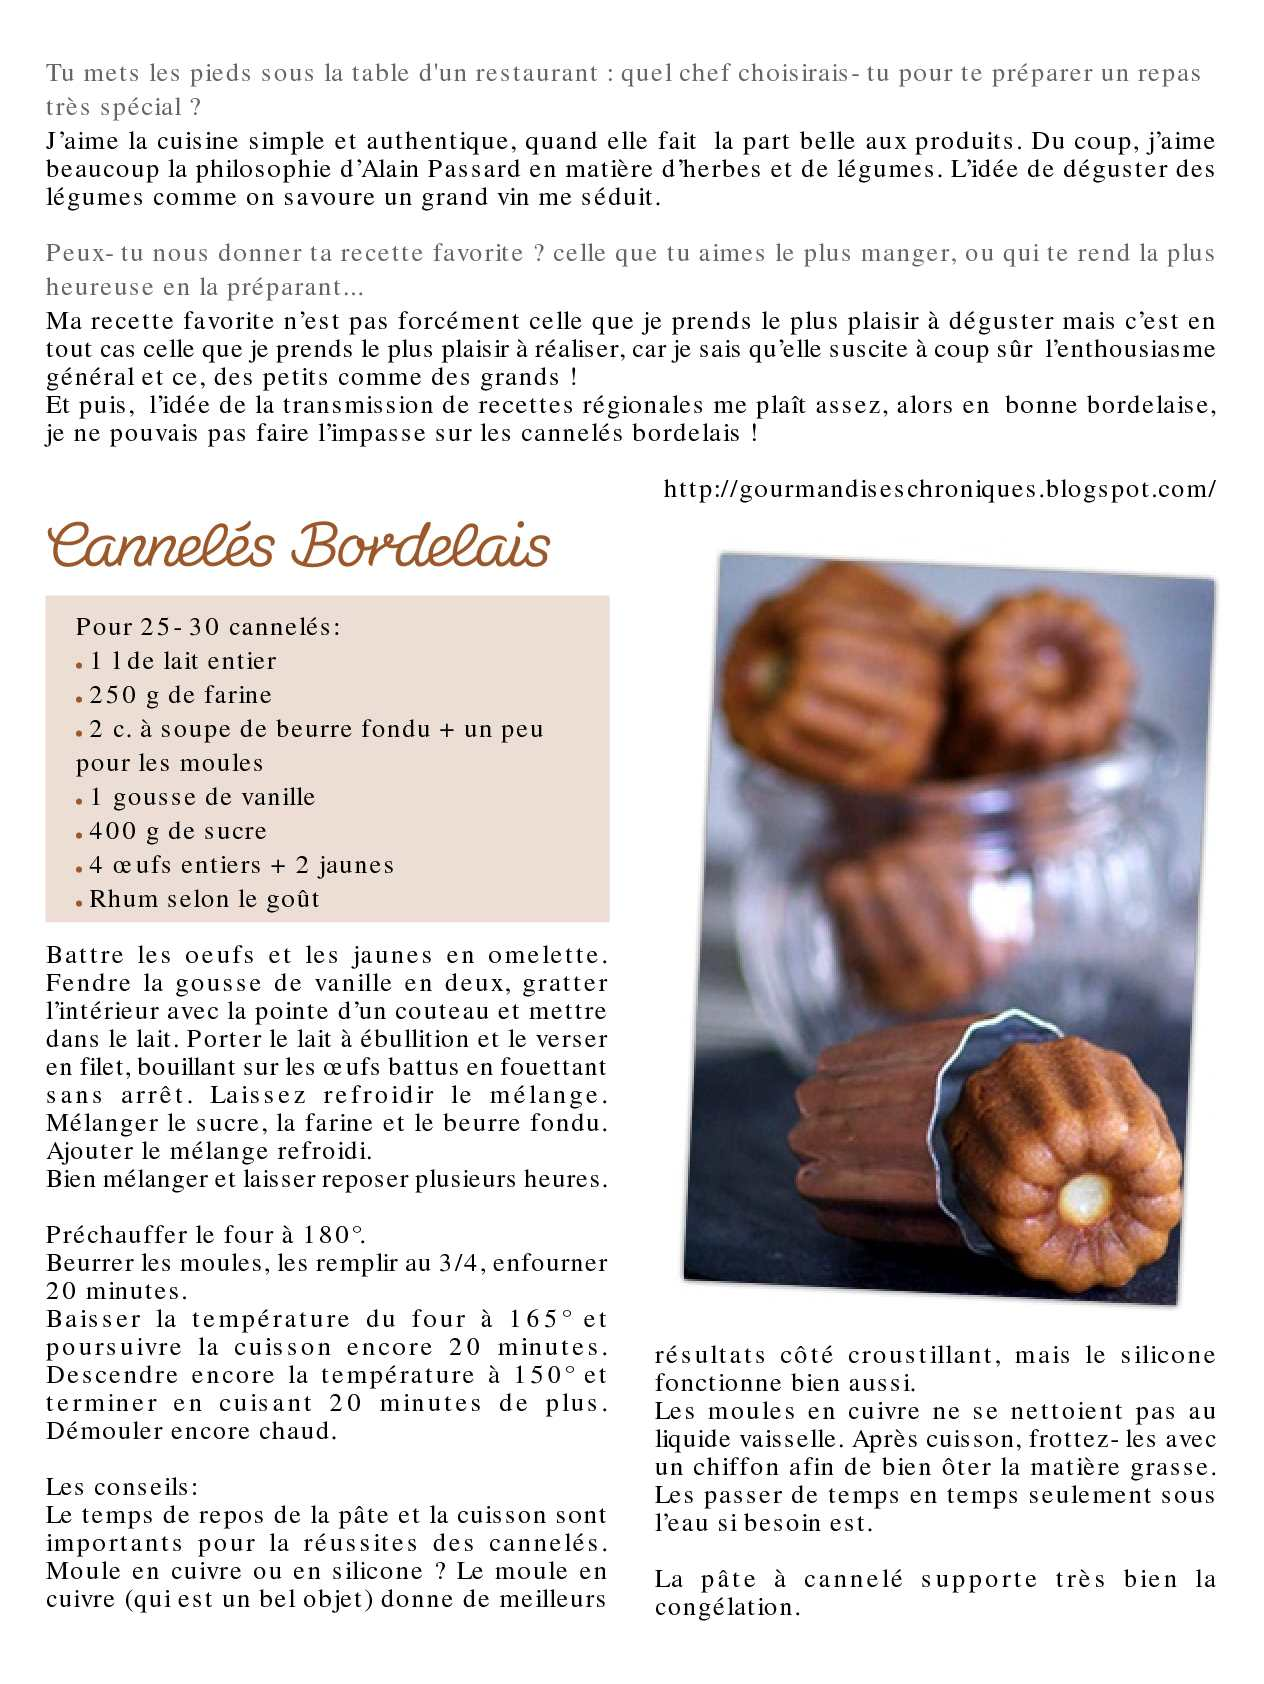 Rondelle D Oignon Sous Le Pied yummy magazine - calameo downloader